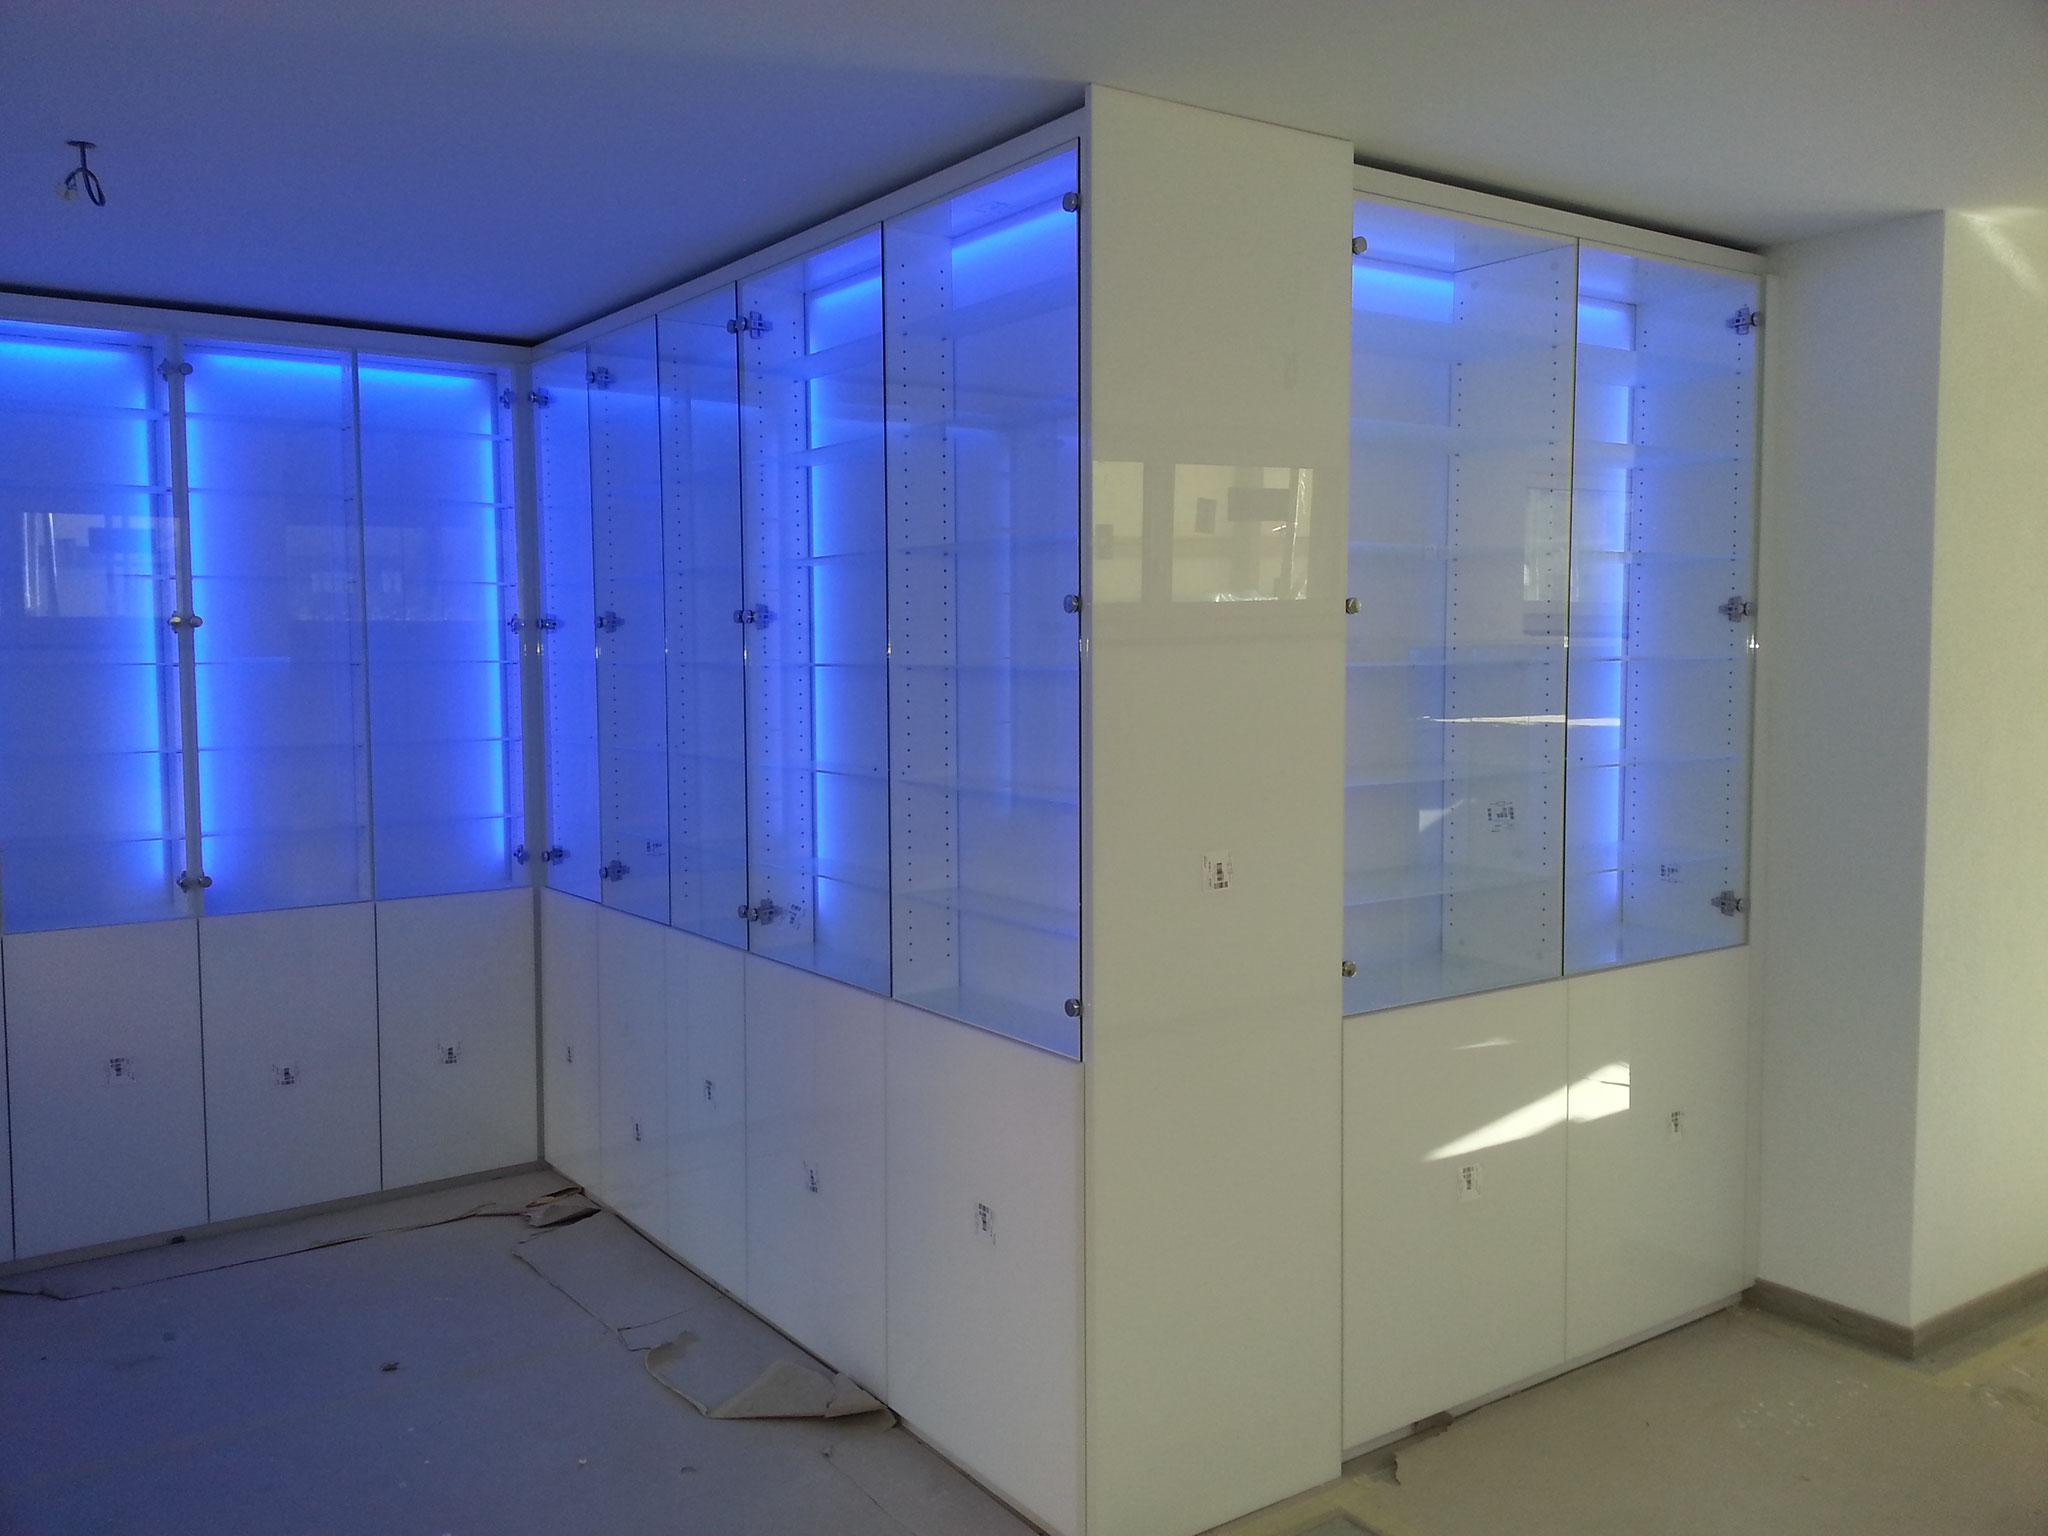 Berühmt Winsome Ideas Dusche Mischbatterie Zeitgenössisch - Heimat ...